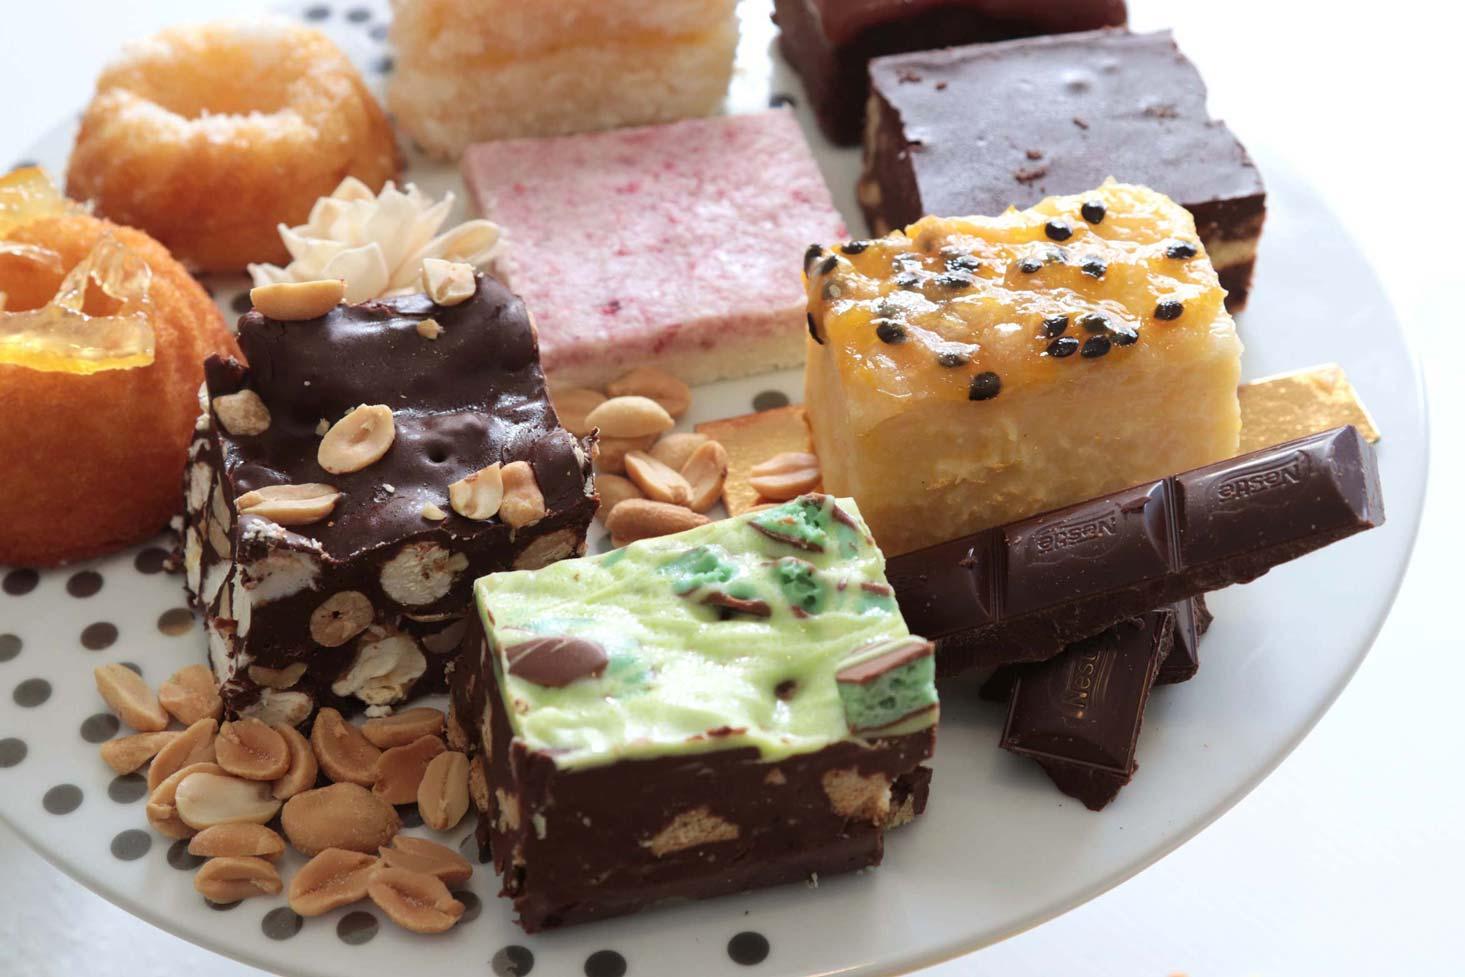 The_Little_Cake_Maker_Perth_Baker_CustomCakes_DayCakes_Slices_Tarts_Cupcakes_Slices_2.jpg